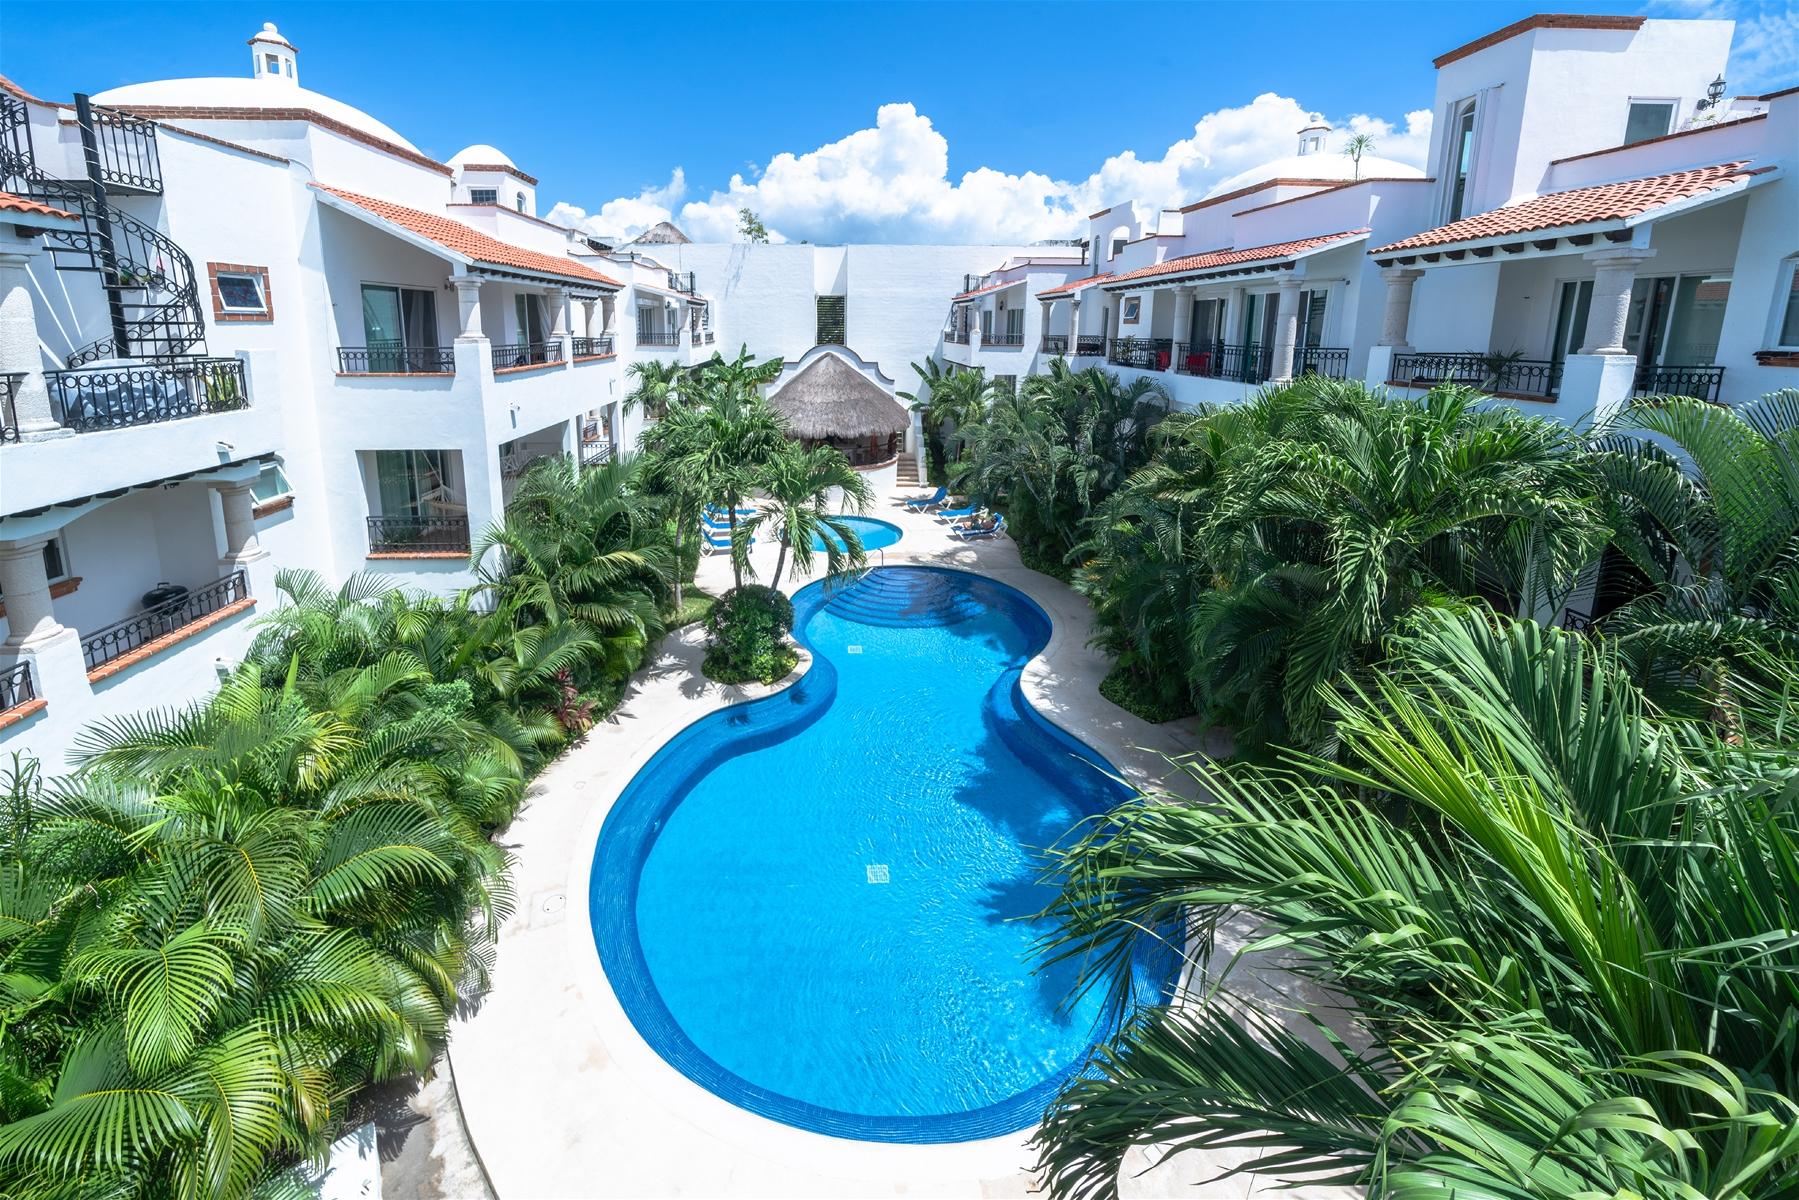 Gaviotas 2 Penthouse Playa del Carmen Condo Home For Sale Real Estate to Buy